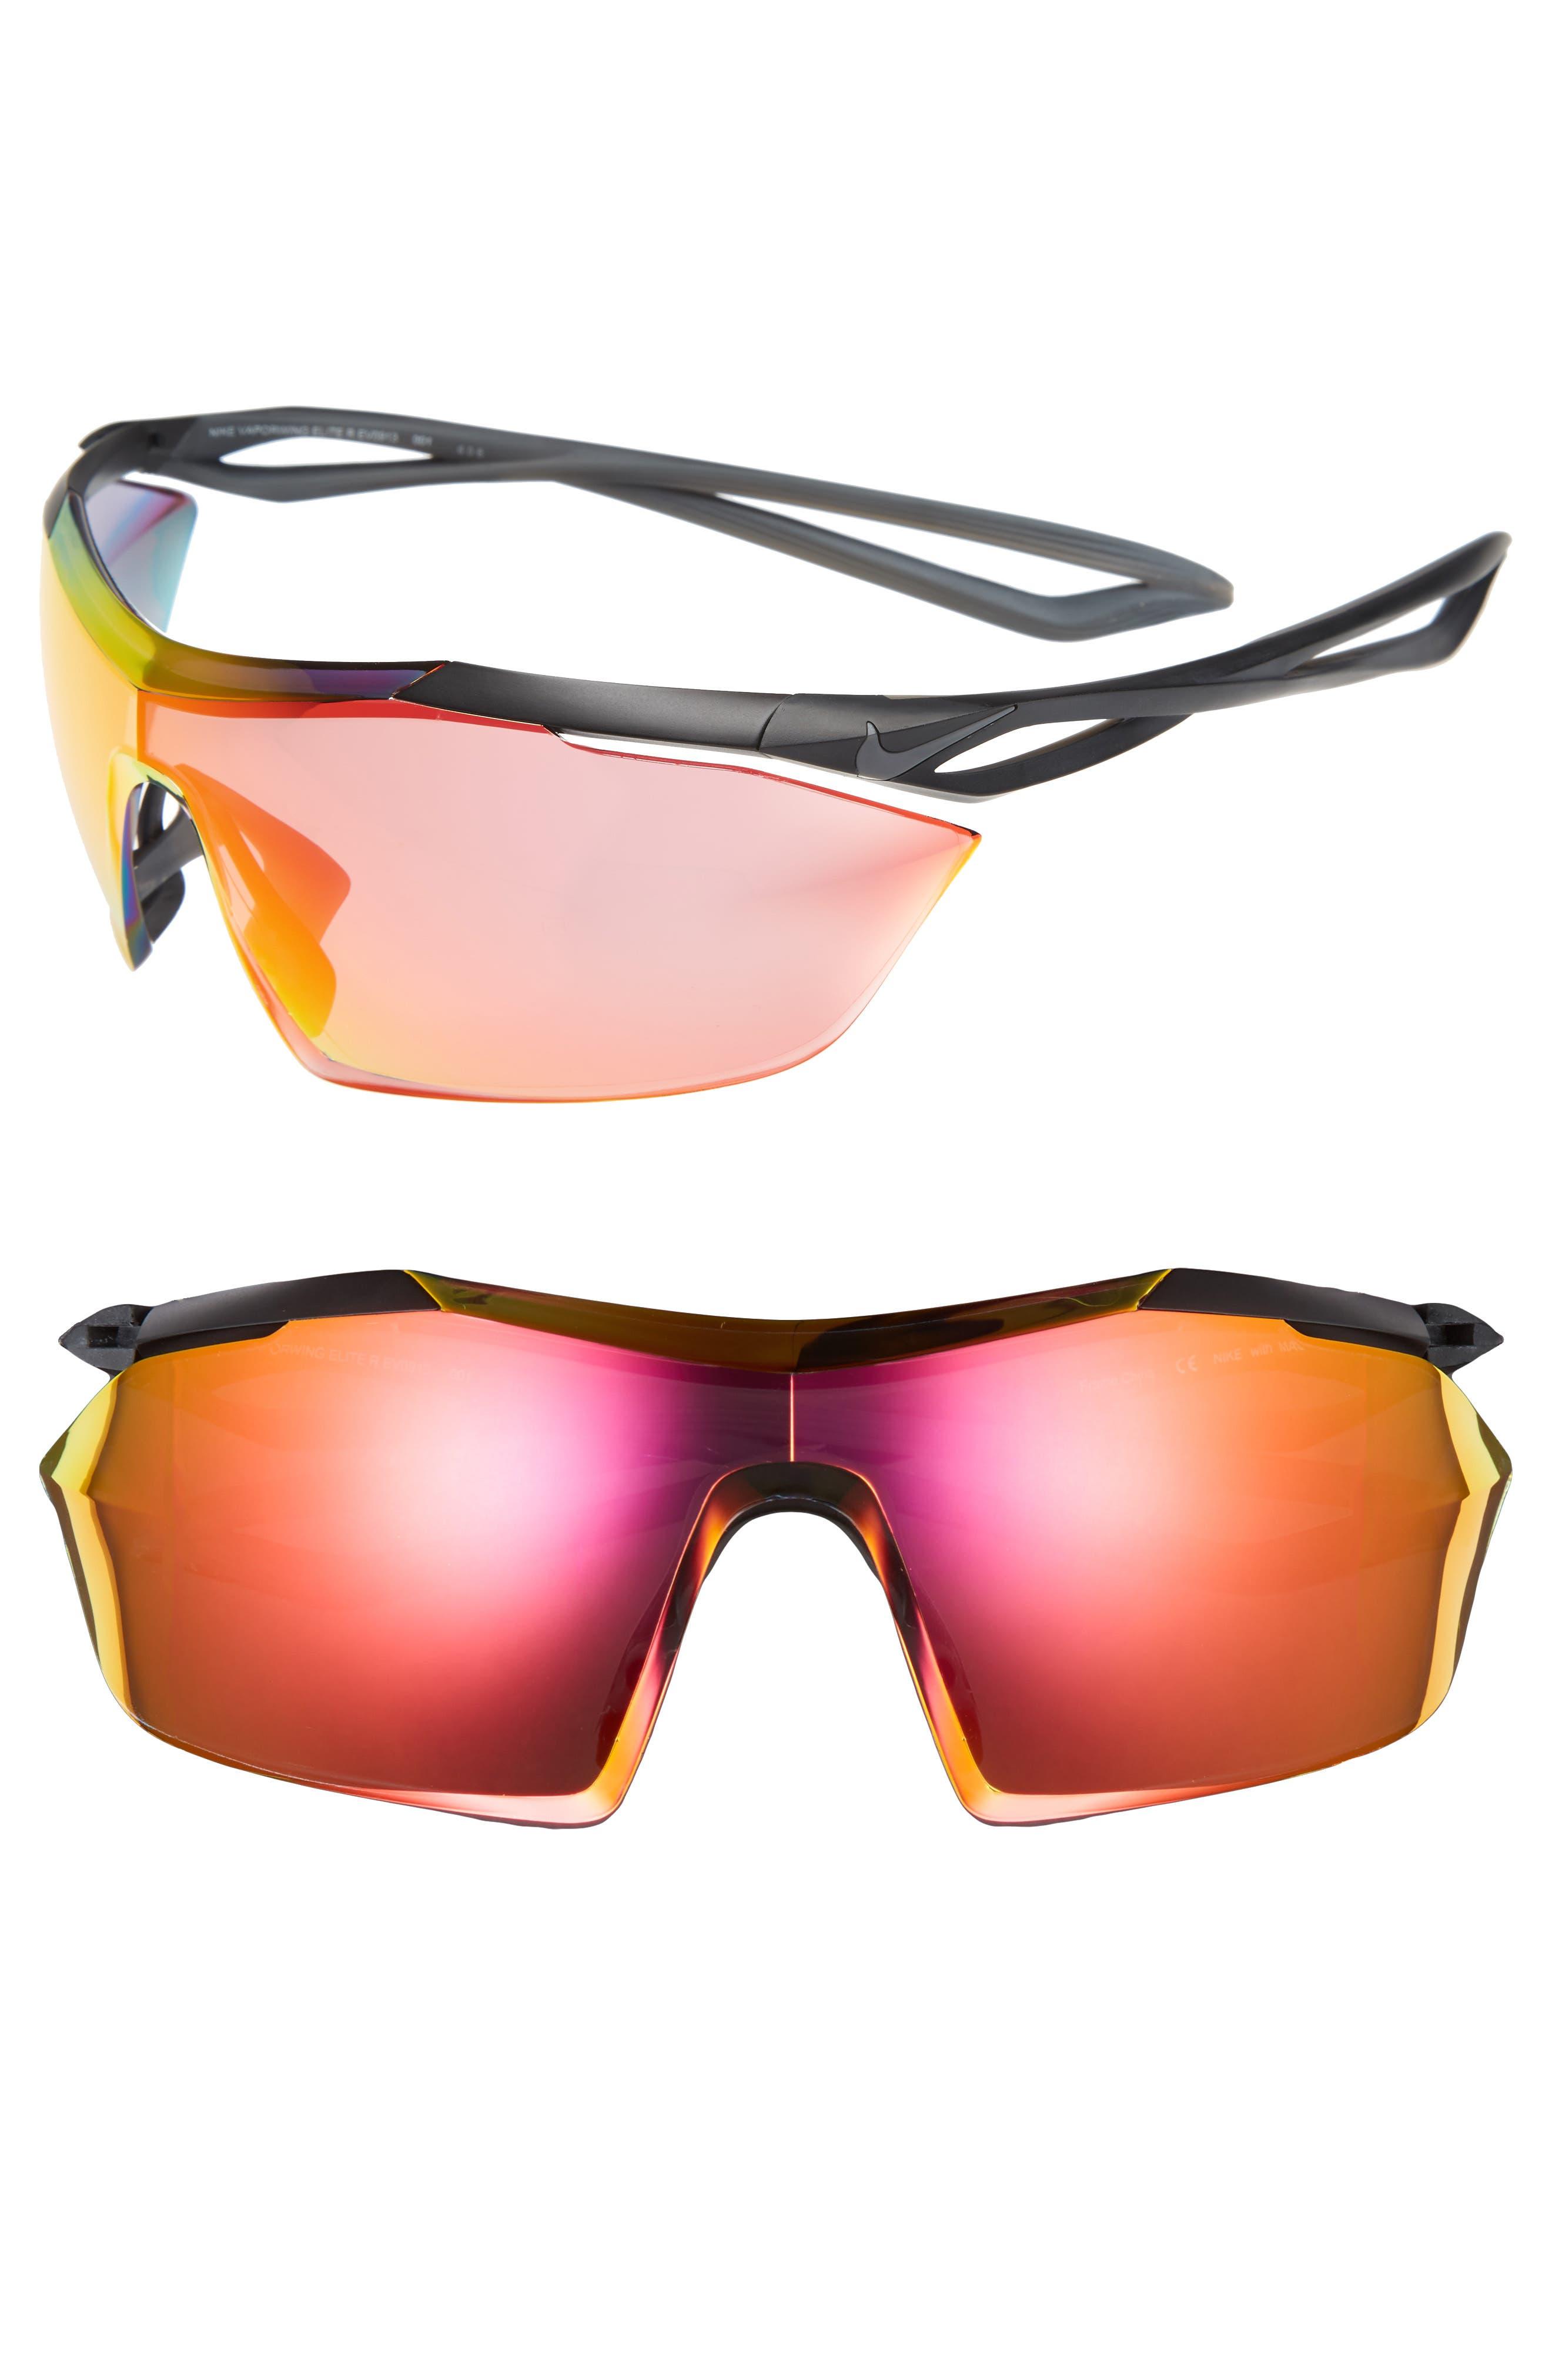 Vaporwing Elite 90mm Running Sunglasses,                         Main,                         color, 001